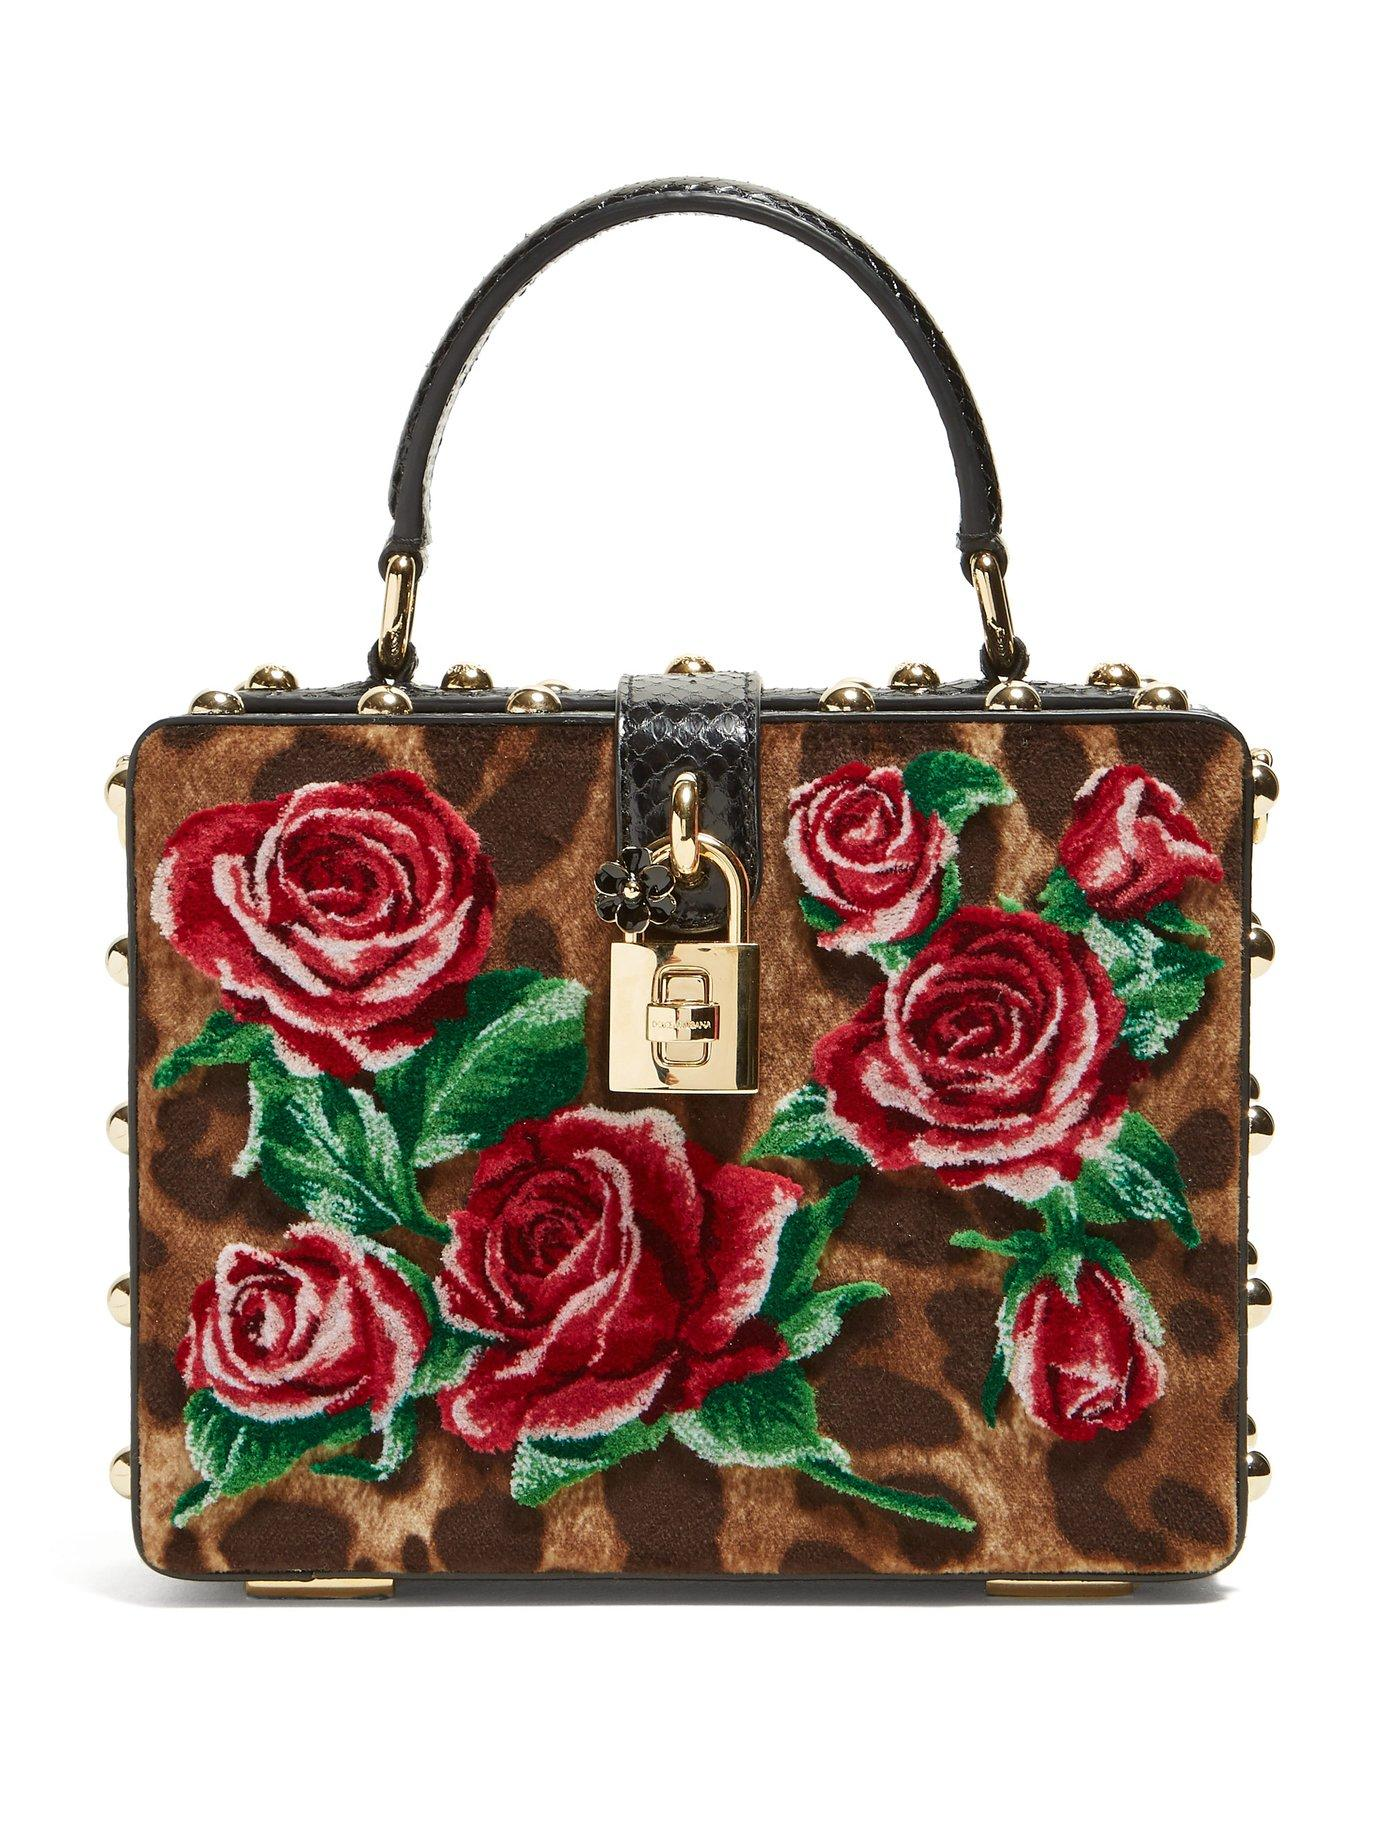 066bb520a17b Lyst - Dolce   Gabbana Leopard Print And Roses Velvet Box Bag